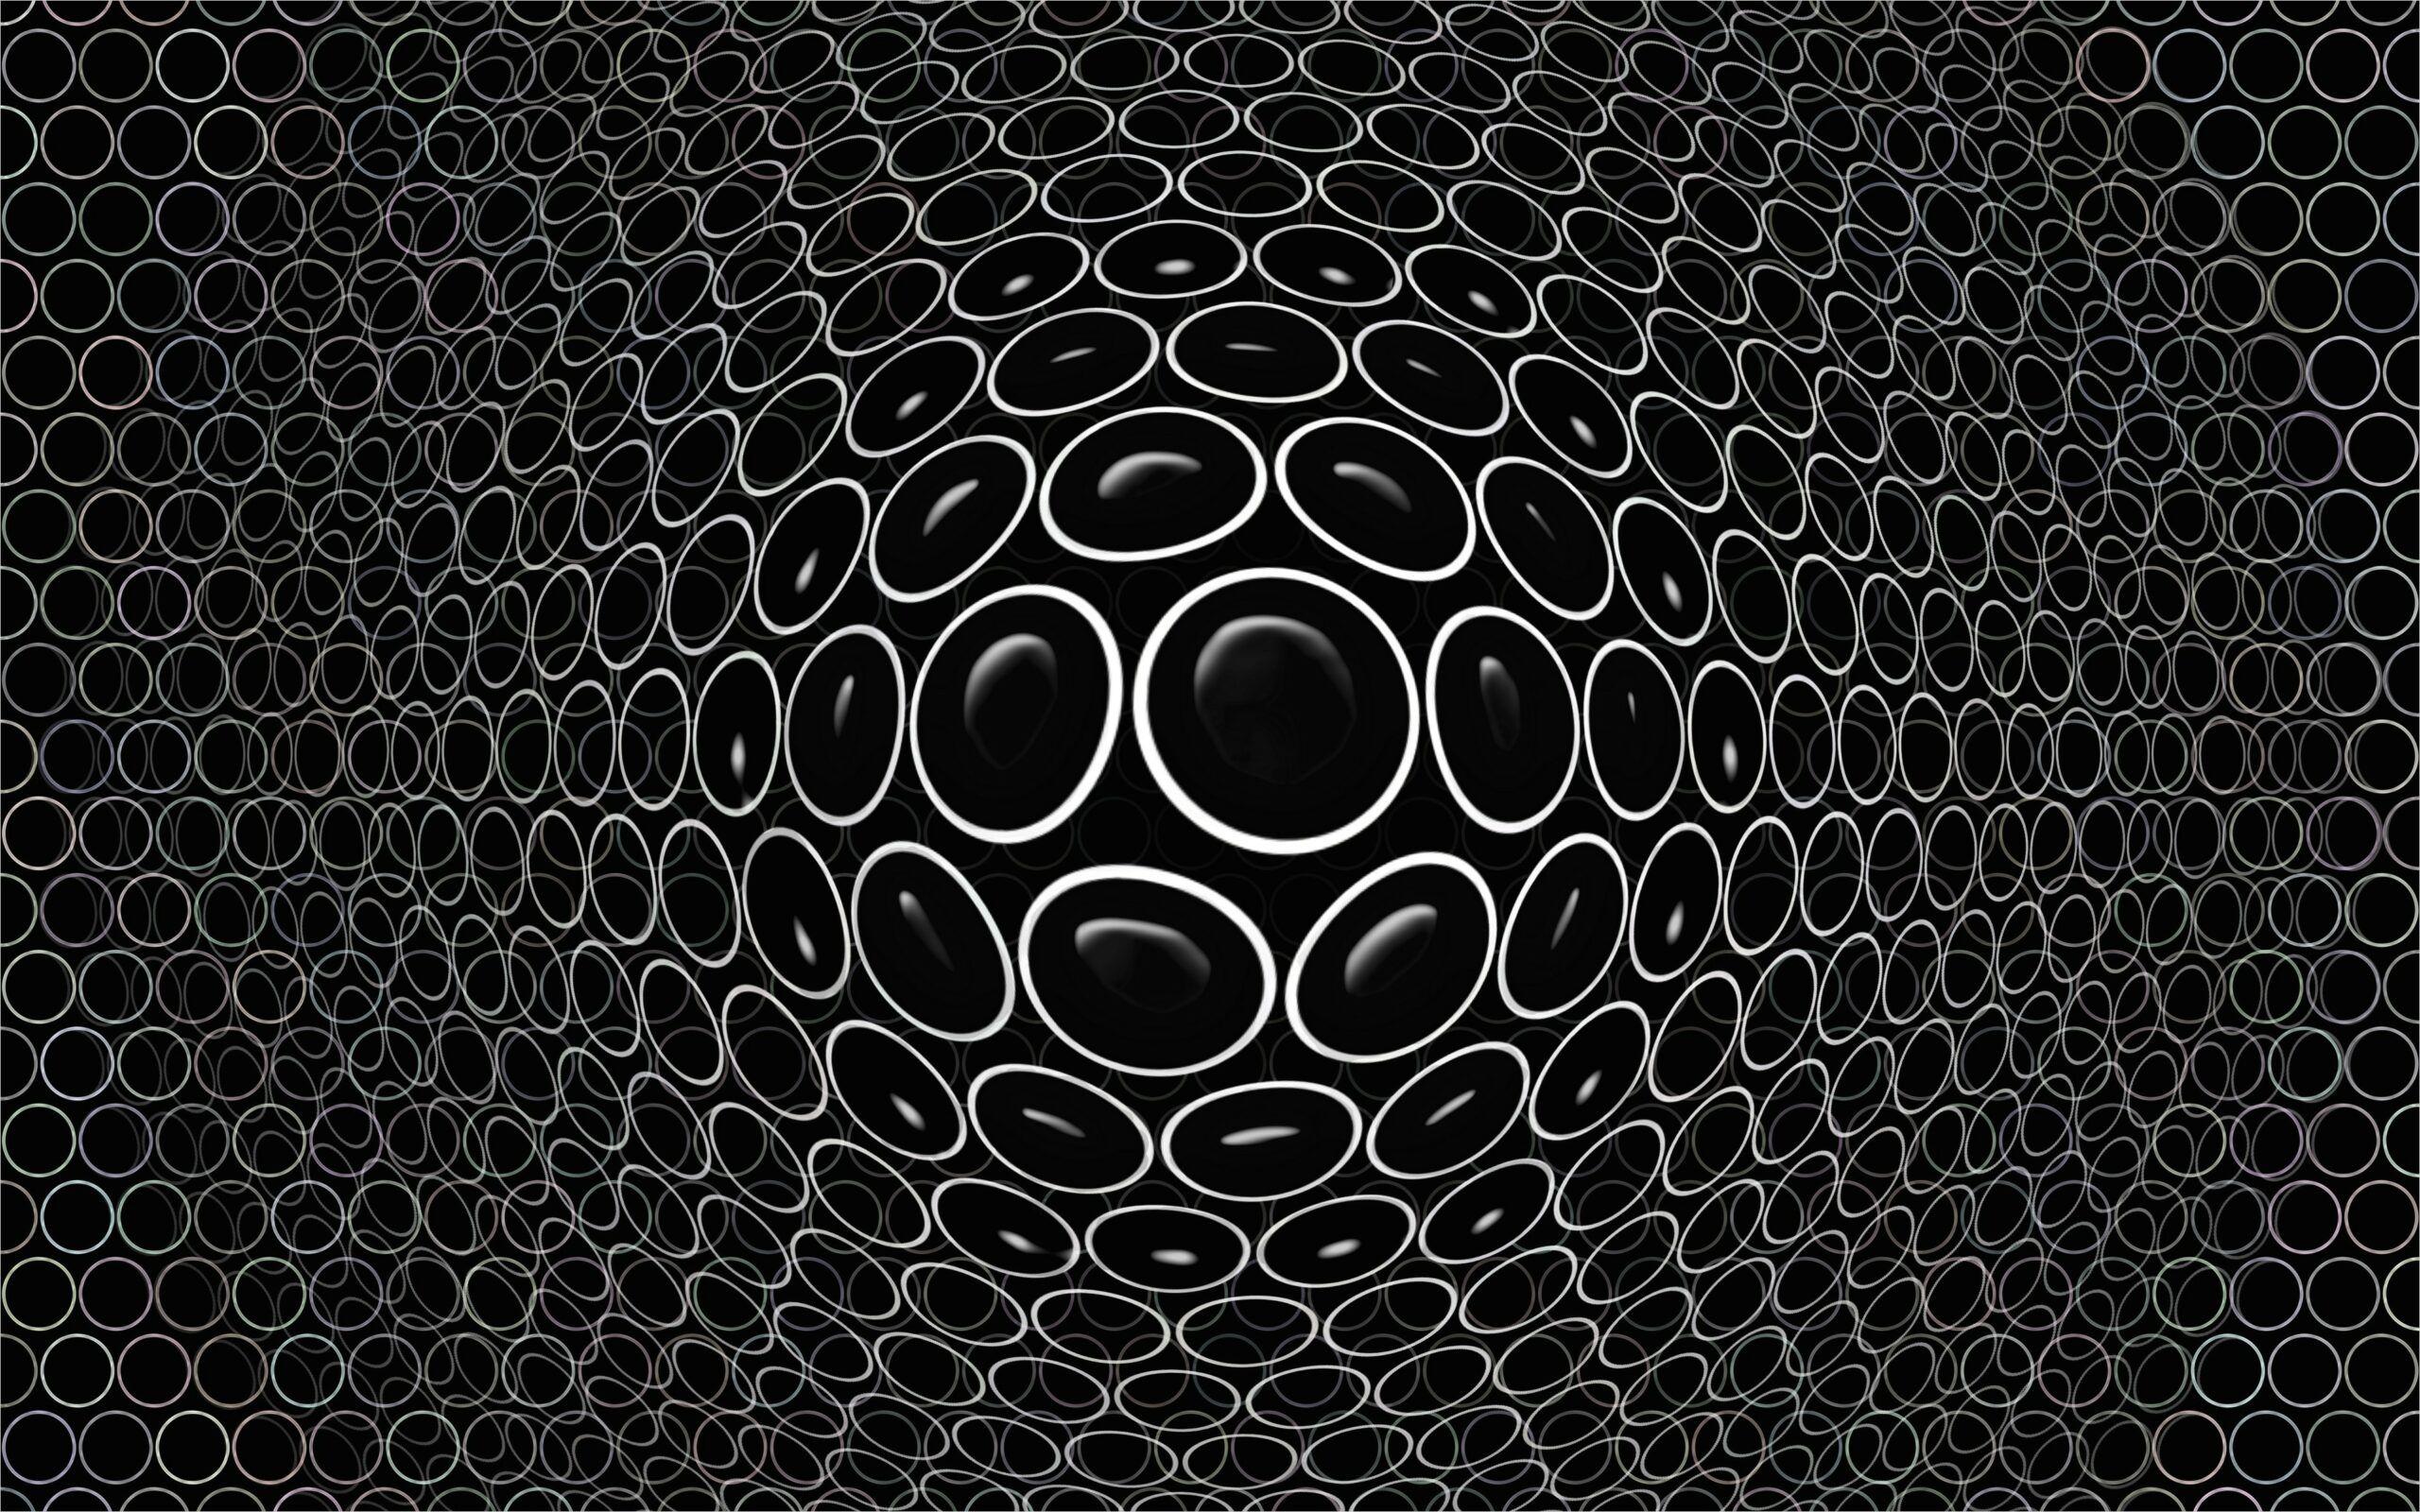 4k 3d Black Wallpaper In 2020 Black Wallpaper Black Wallpaper